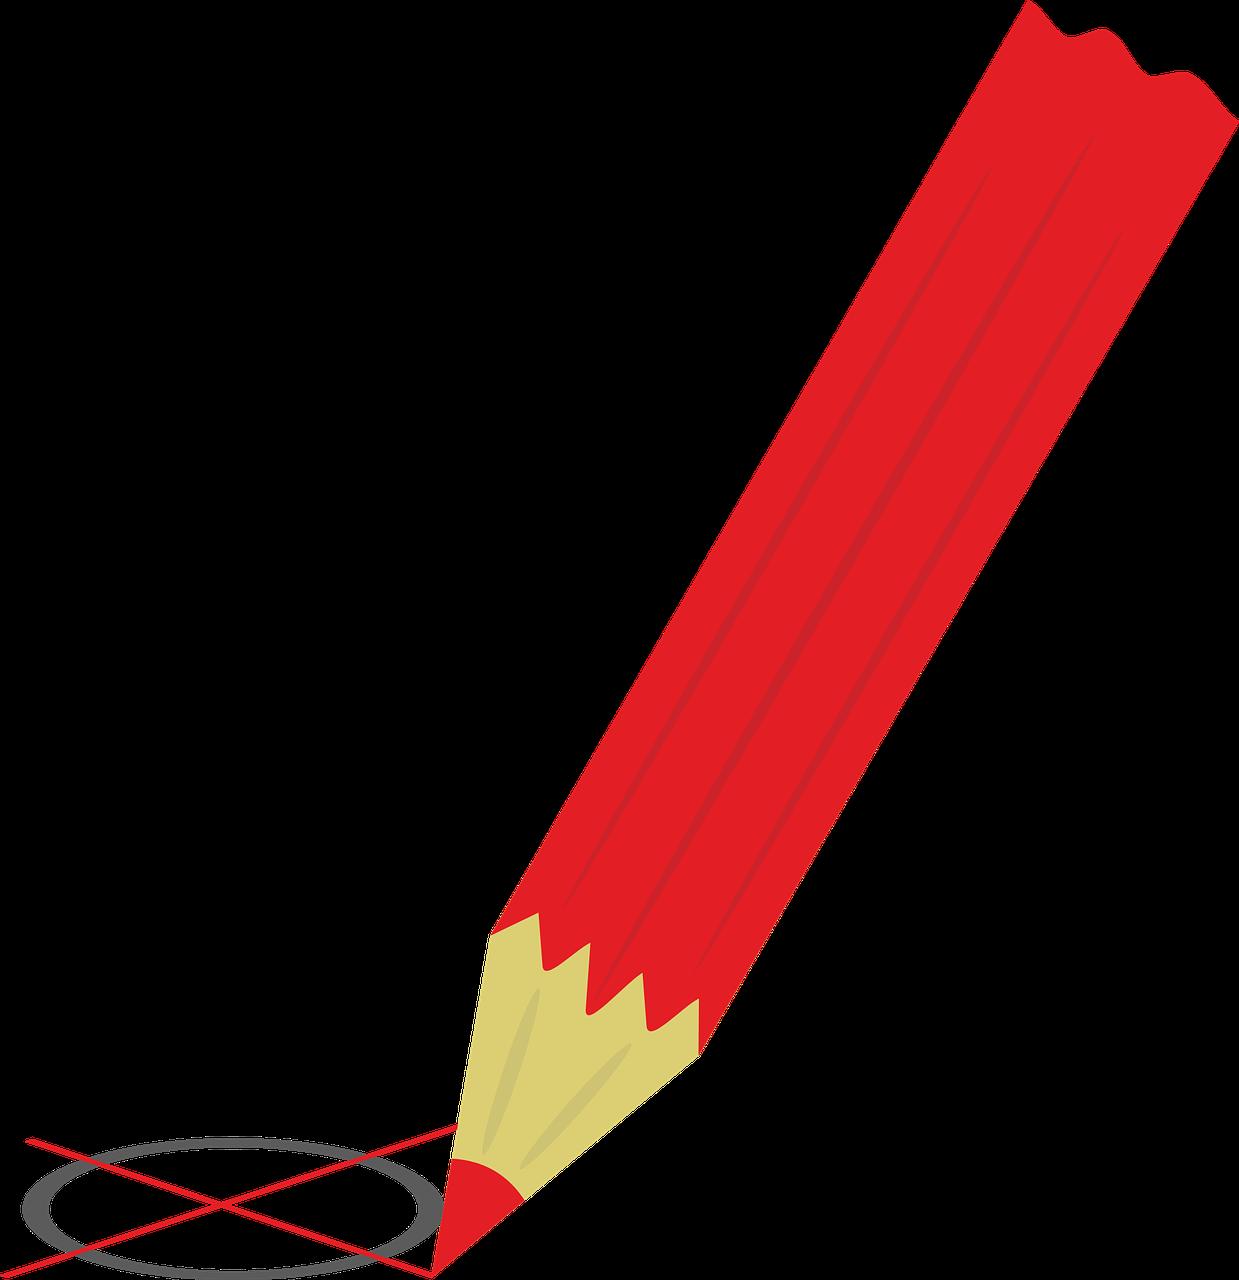 Wahlen-001_succo-pixabay.png